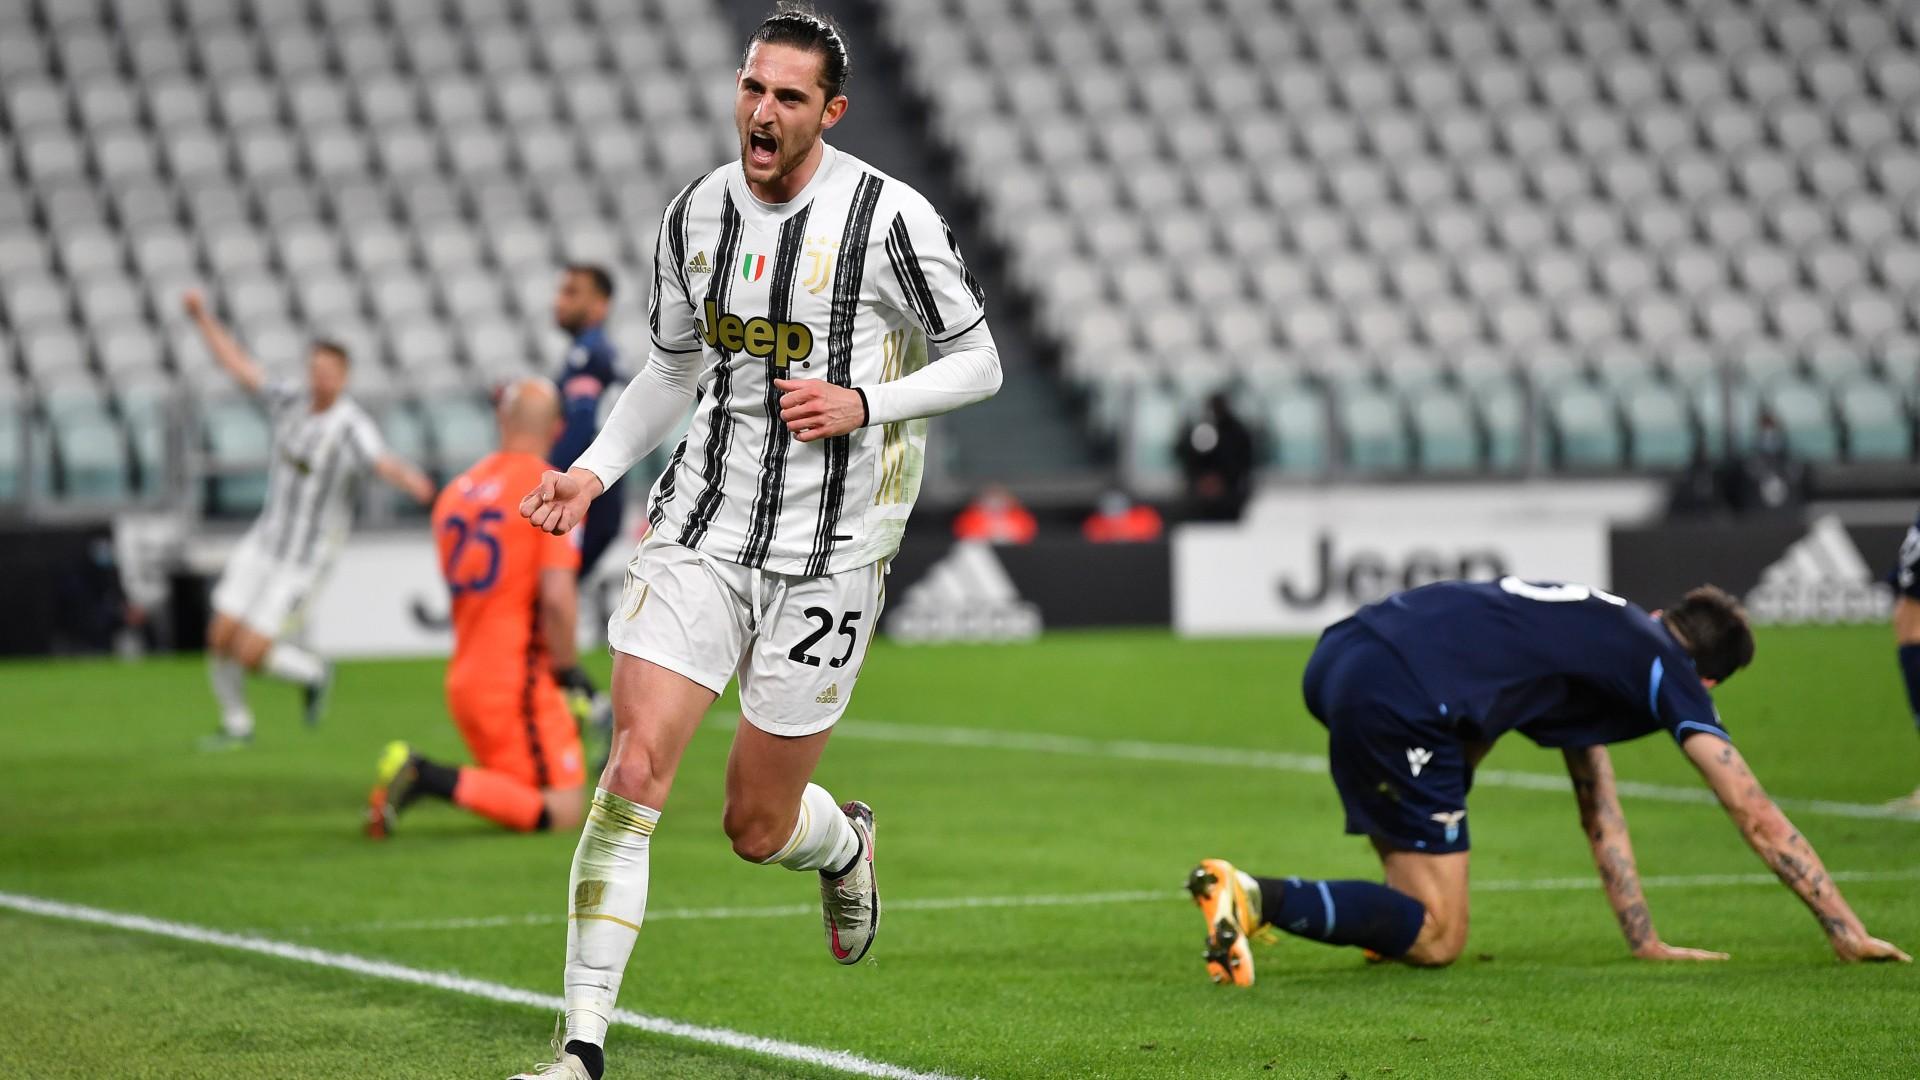 Juventus-Lazio 3-1: Rabiot e doppio Morata, rimonta bianconera